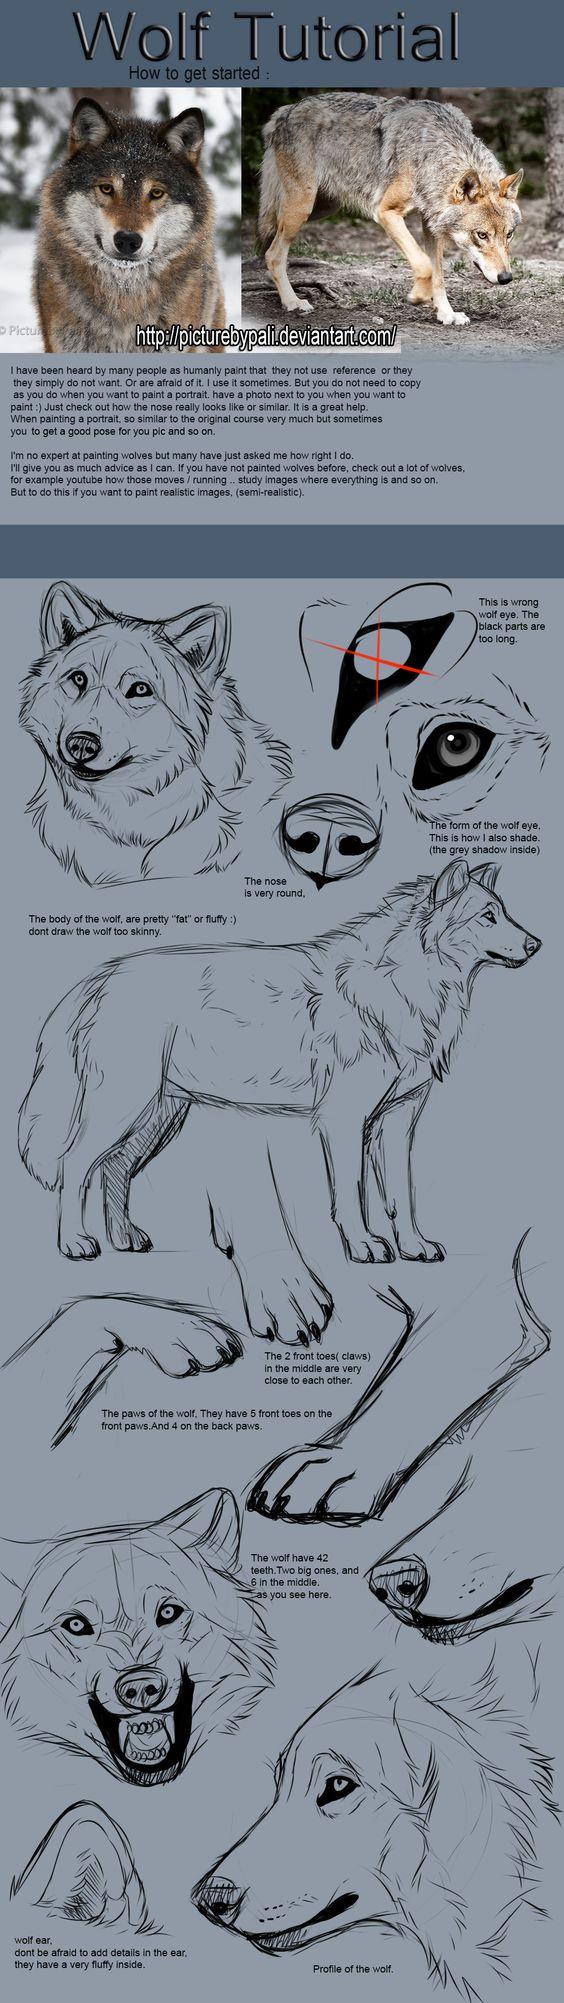 Wolf Tutorial by TheMysticWolf on Deviantart Much need. Much want.